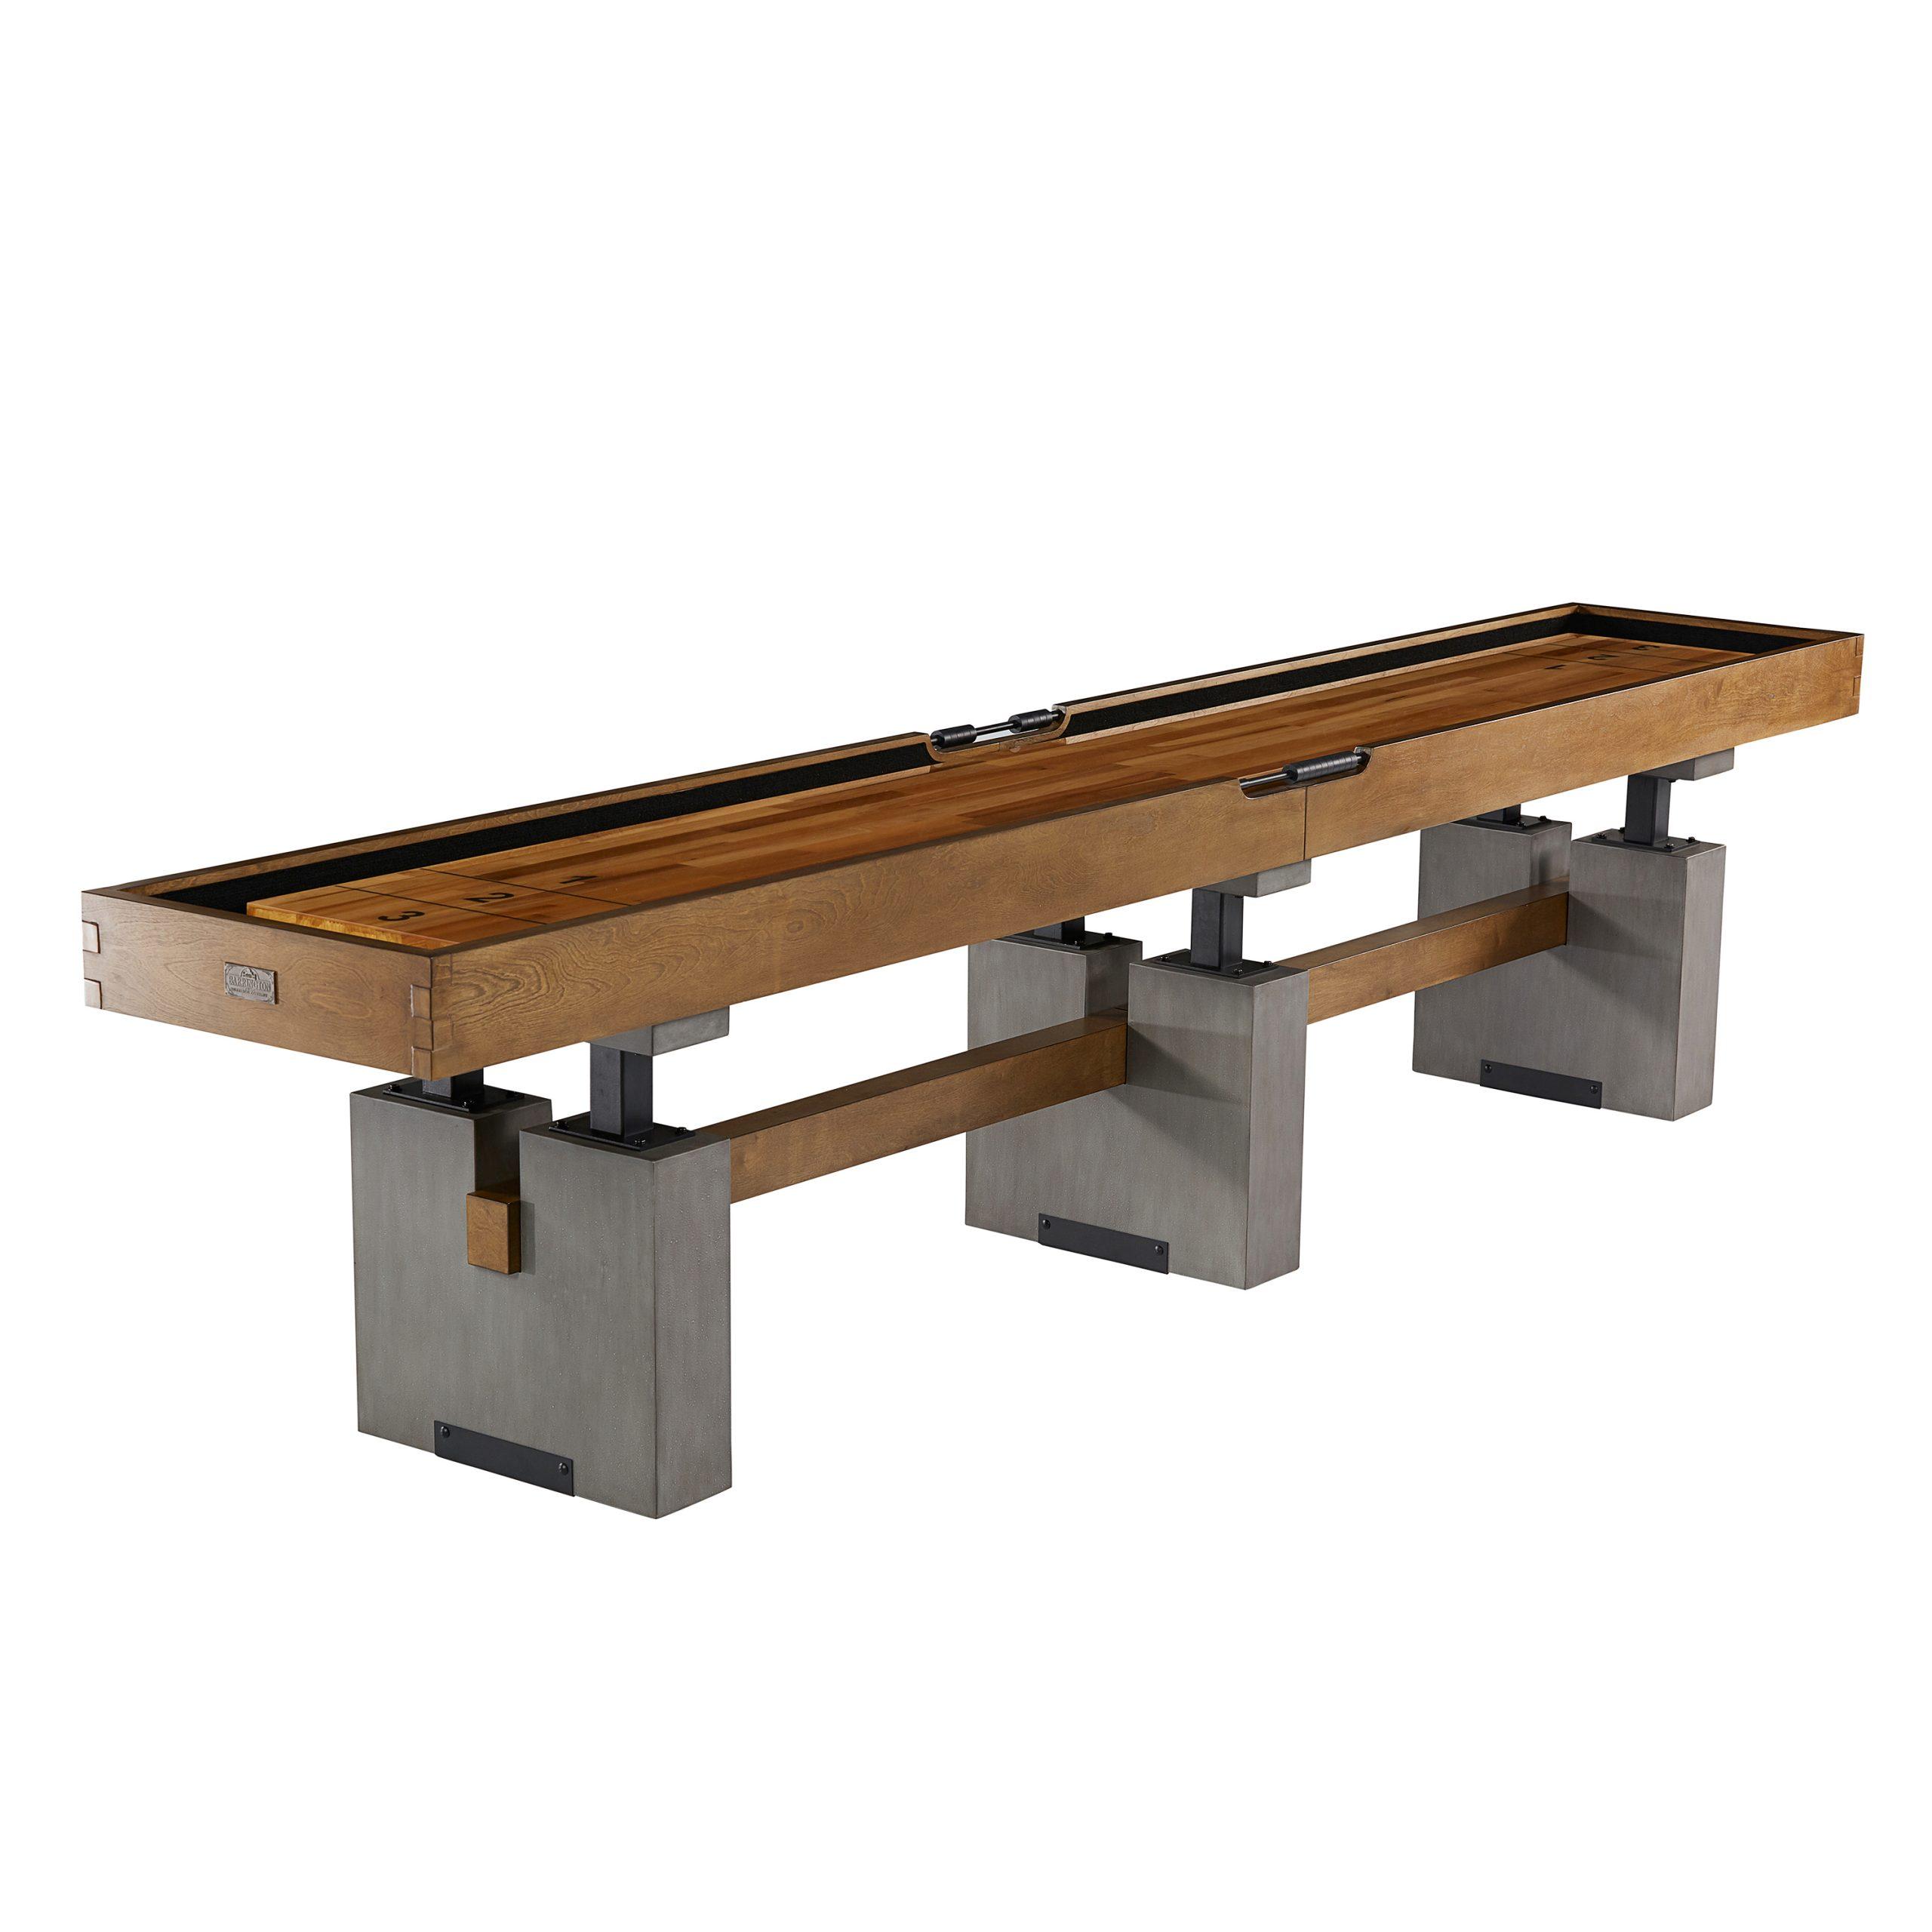 Barrington 12 Ft. Clyborne Shuffleboard Table